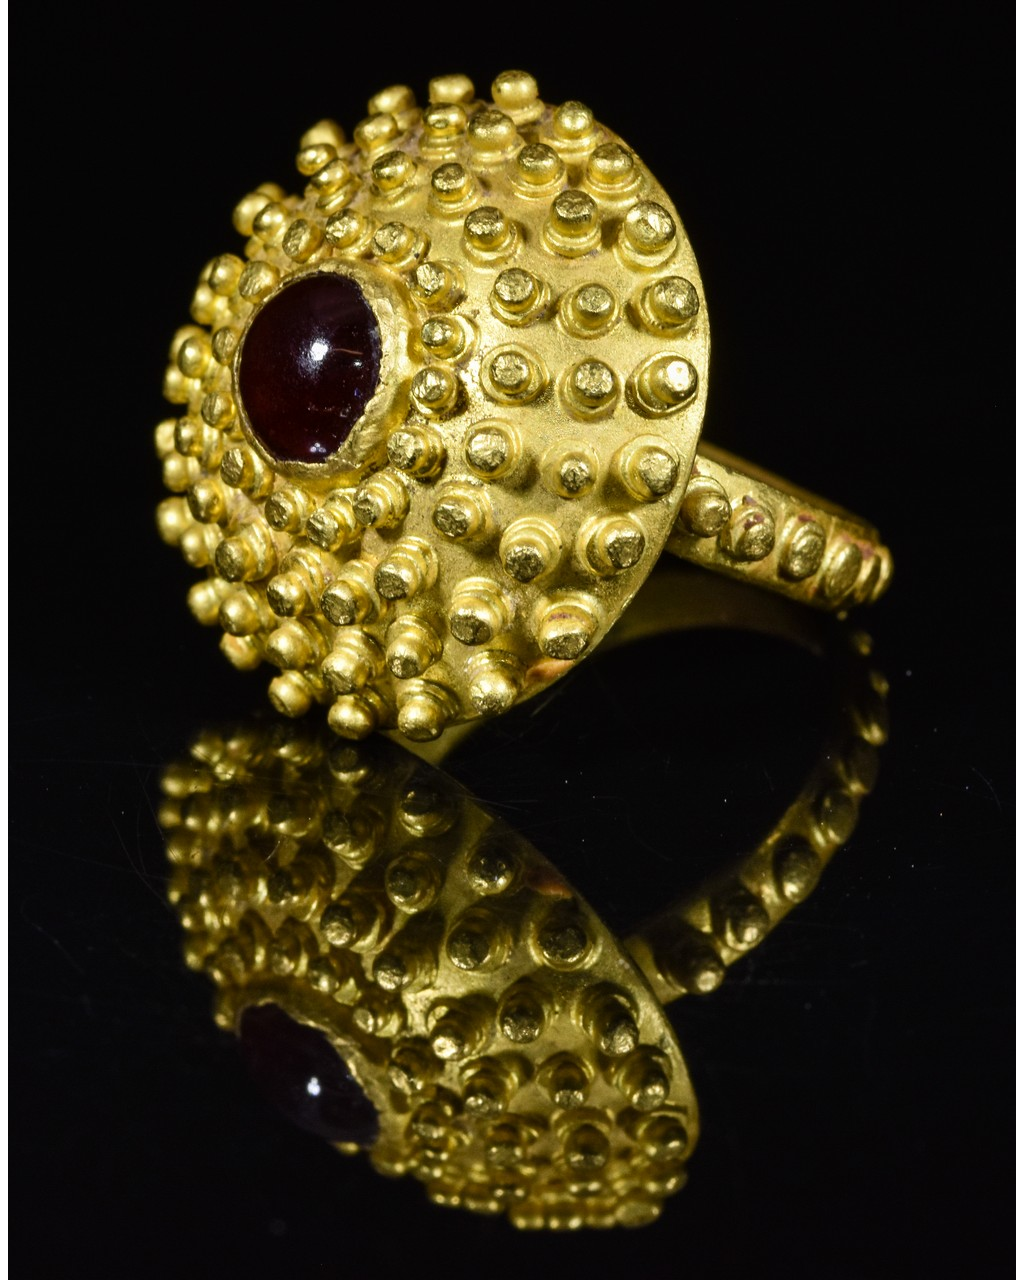 Lot 2 - ROMAN GOLD RING WITH GARNET STONE